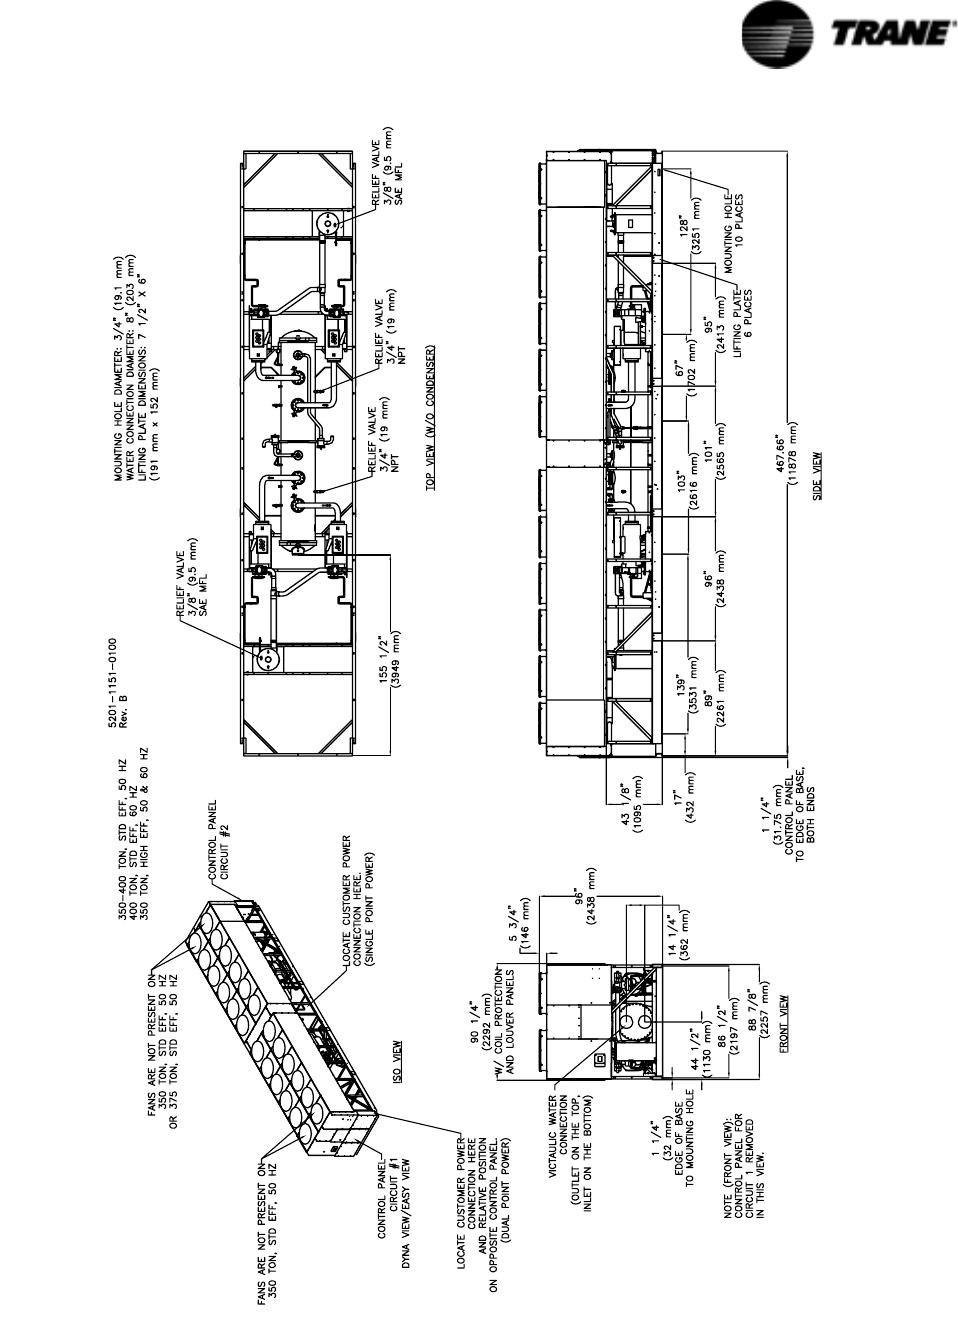 Trane rtac 140 400 users manual svx01f en 01012006 iom series r rtac svx01f en 21 ccuart Image collections